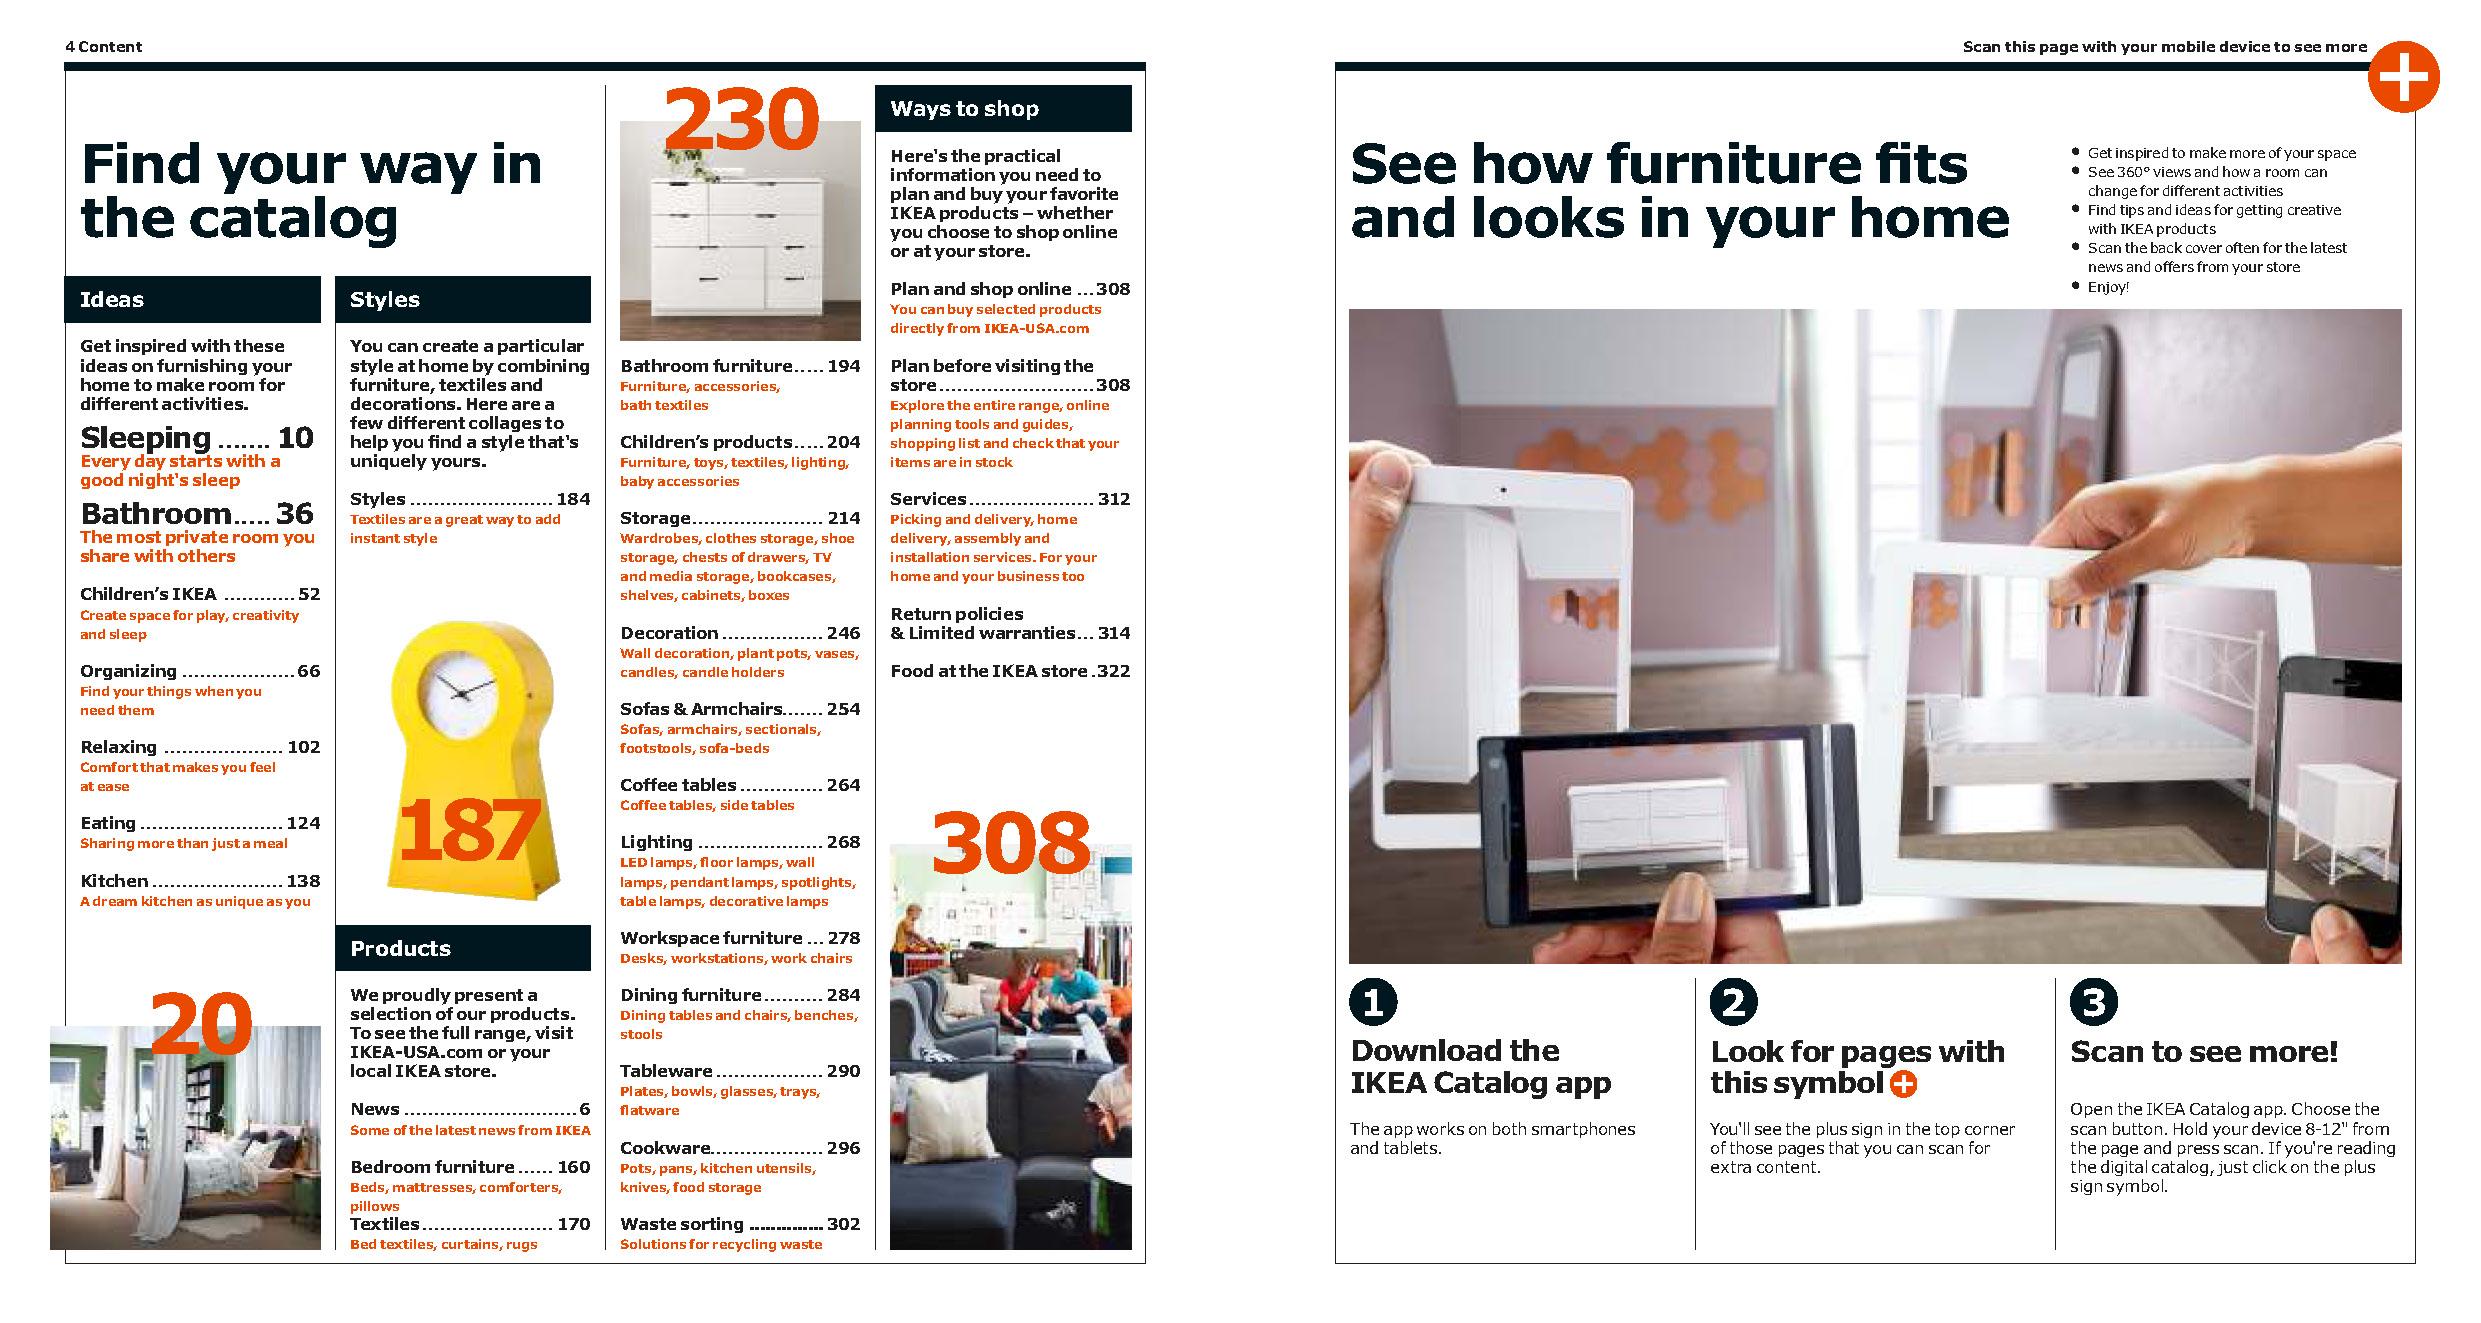 Catalogs - Ikea USA Catalog 2015